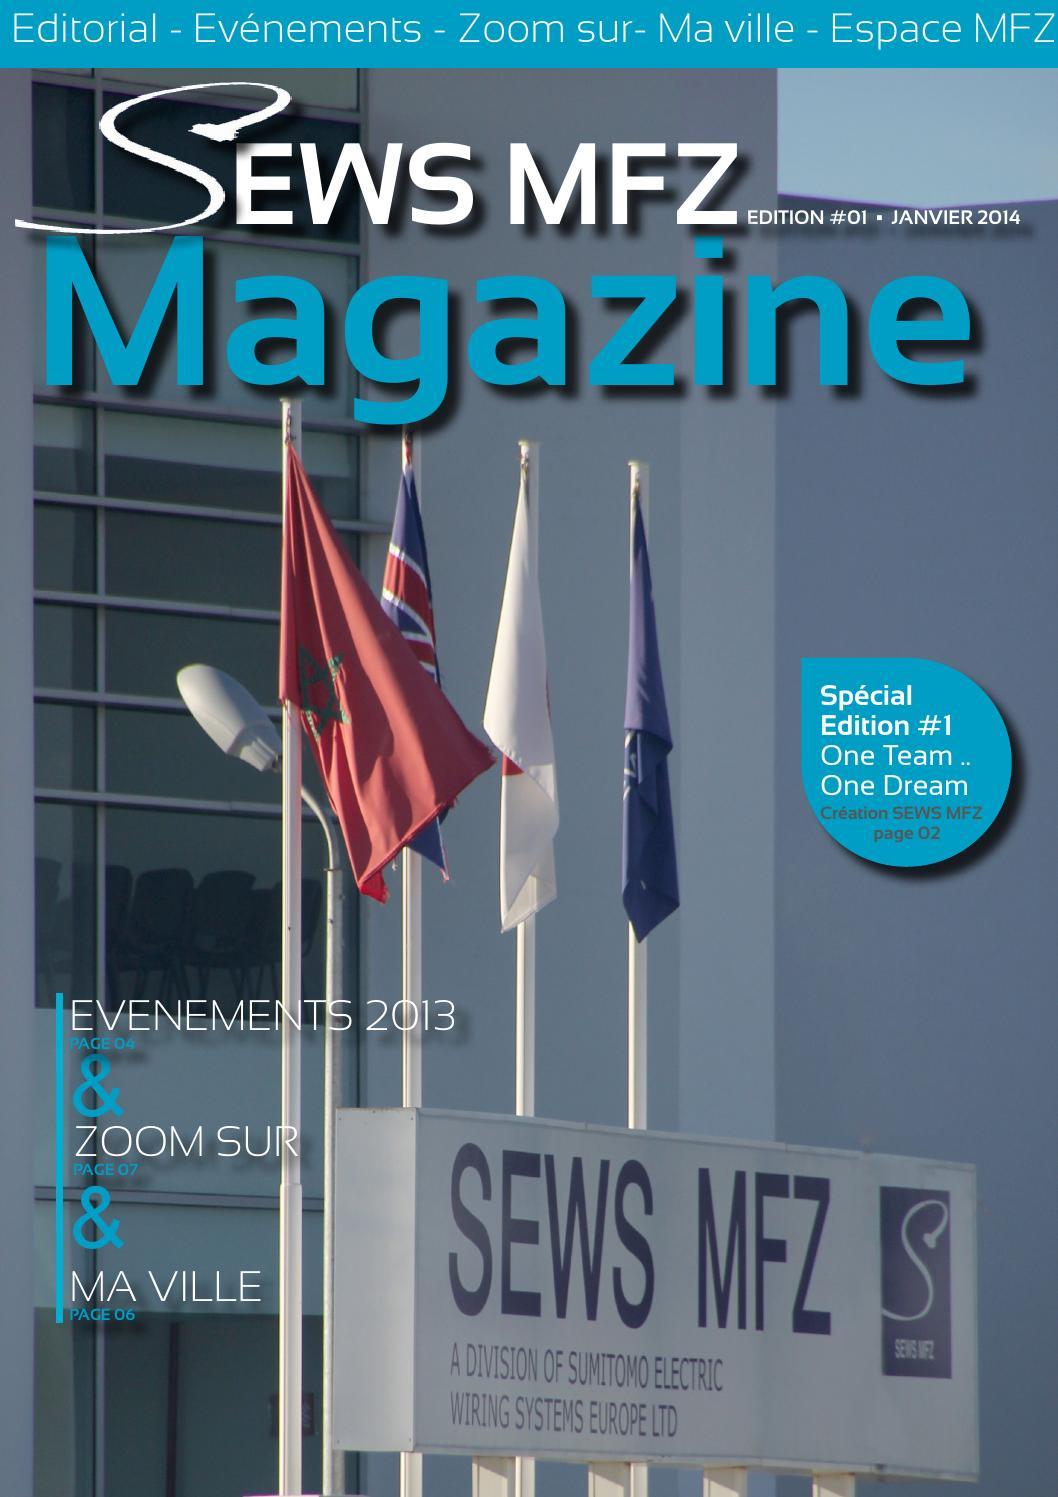 Sews 3 By Montasser Lamsamdi Issuu Sumitomo Electric Wiring Systems Europe Ltd